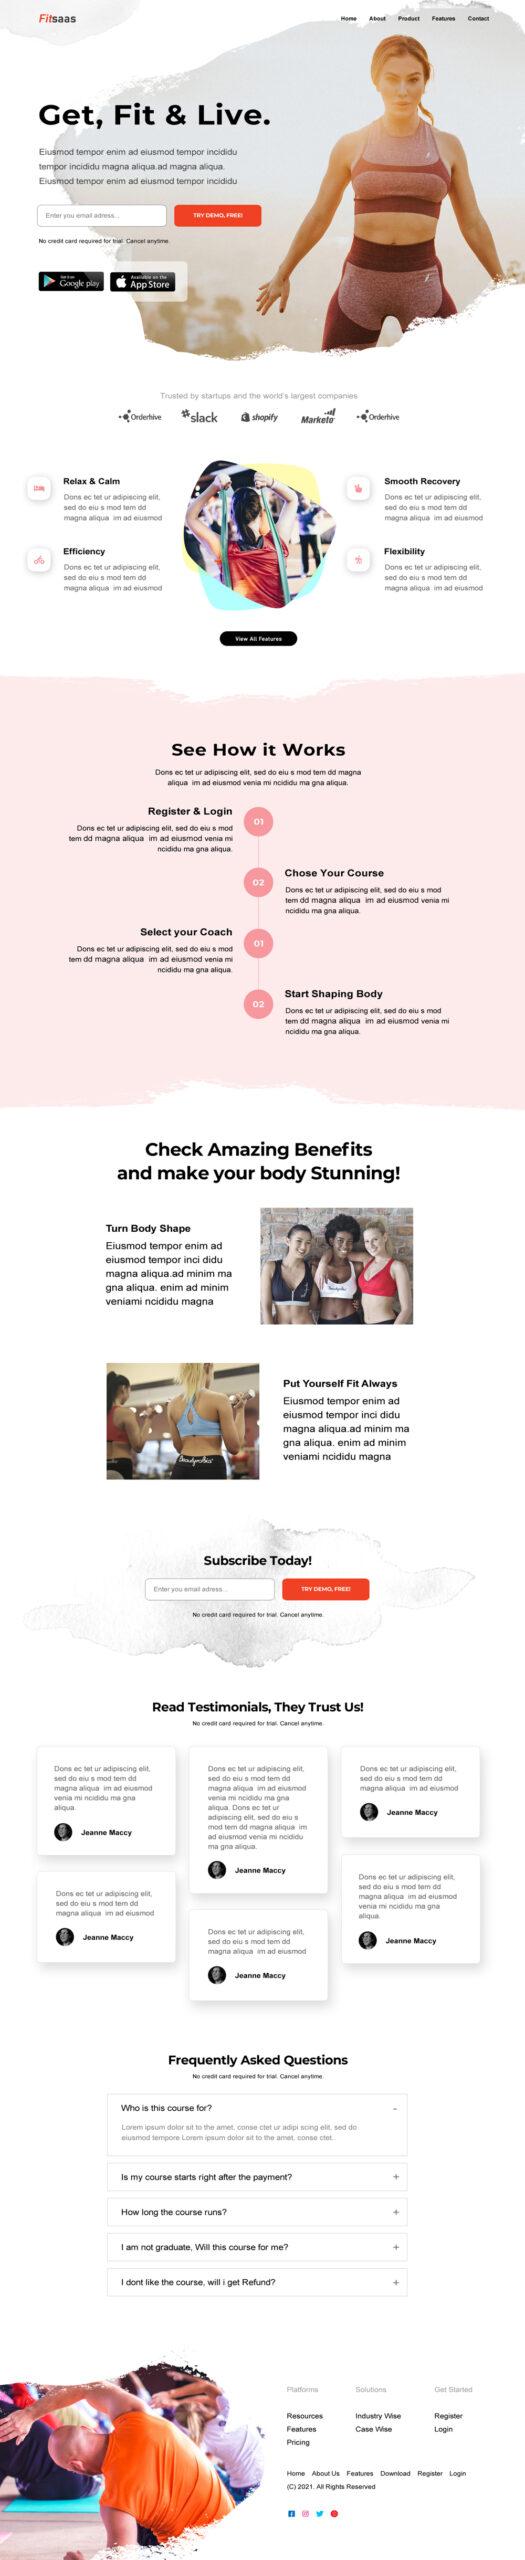 Health Saas Landing Page